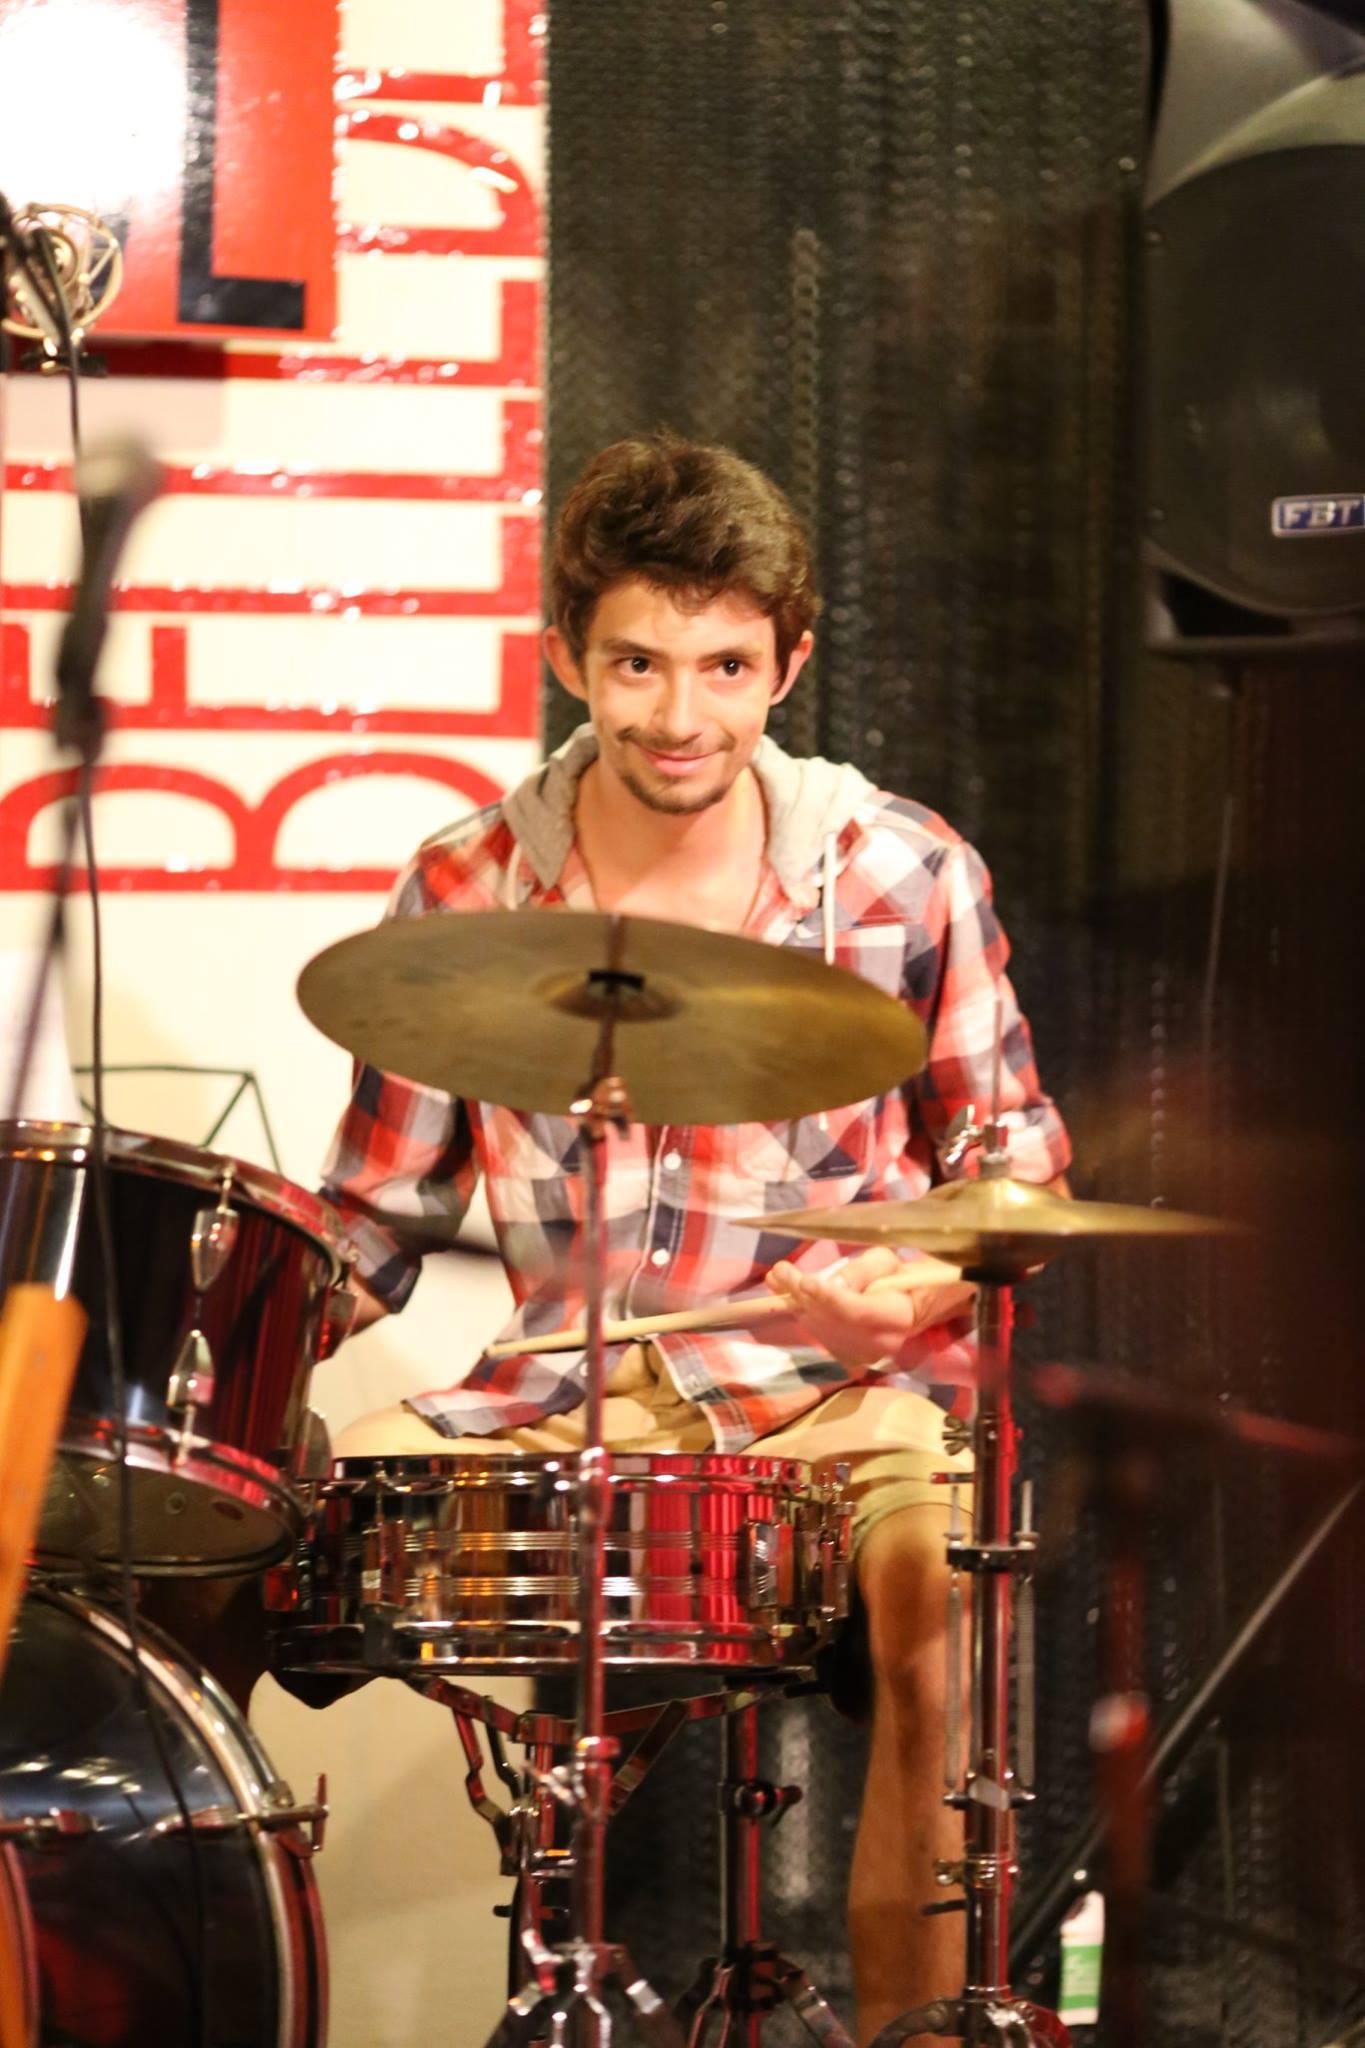 Dimitri Sumian